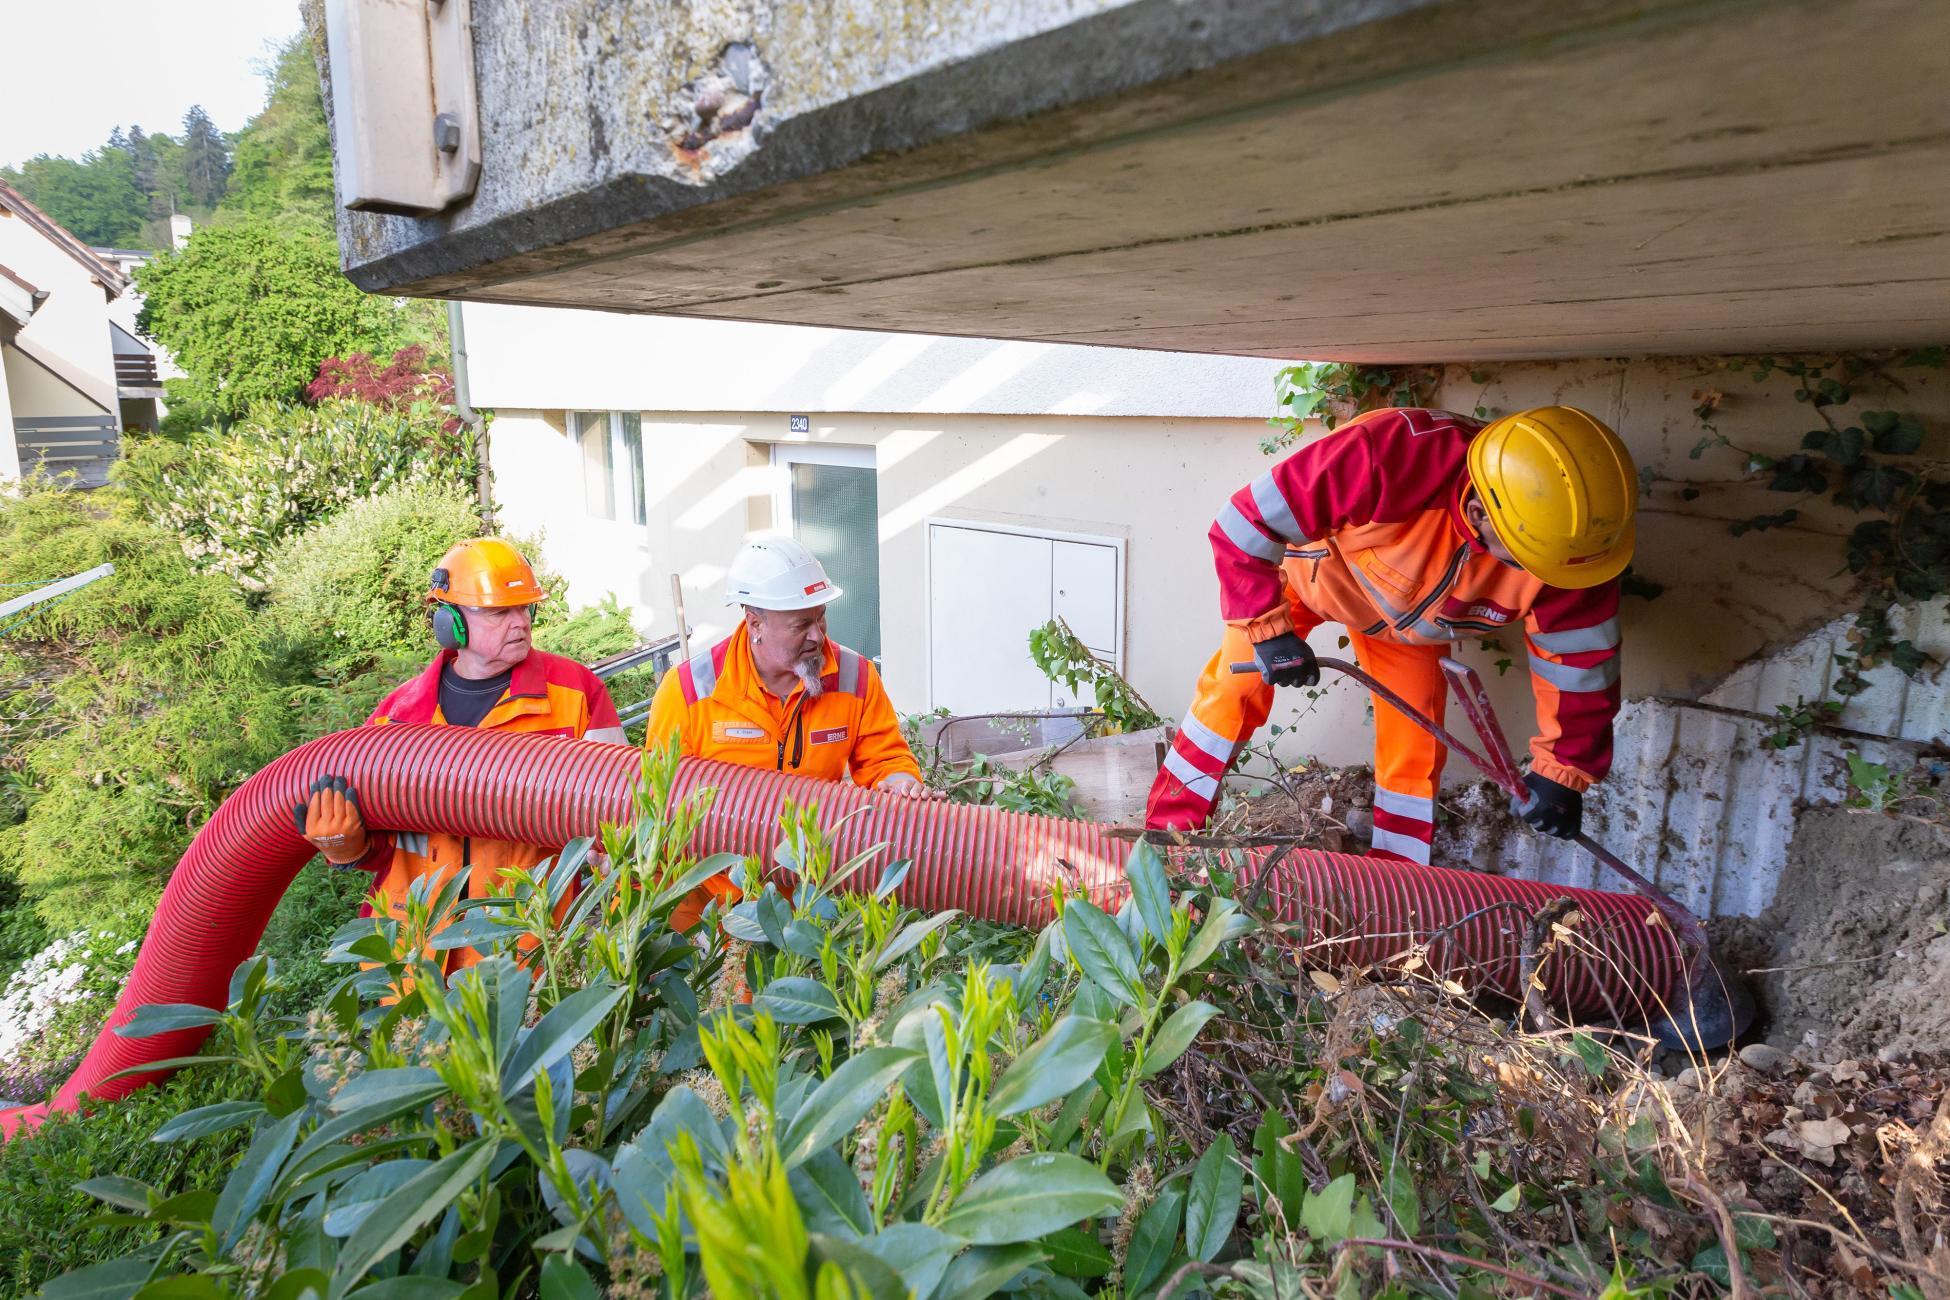 Brugg Wasserleitungsbruch Defekt unter Balkon